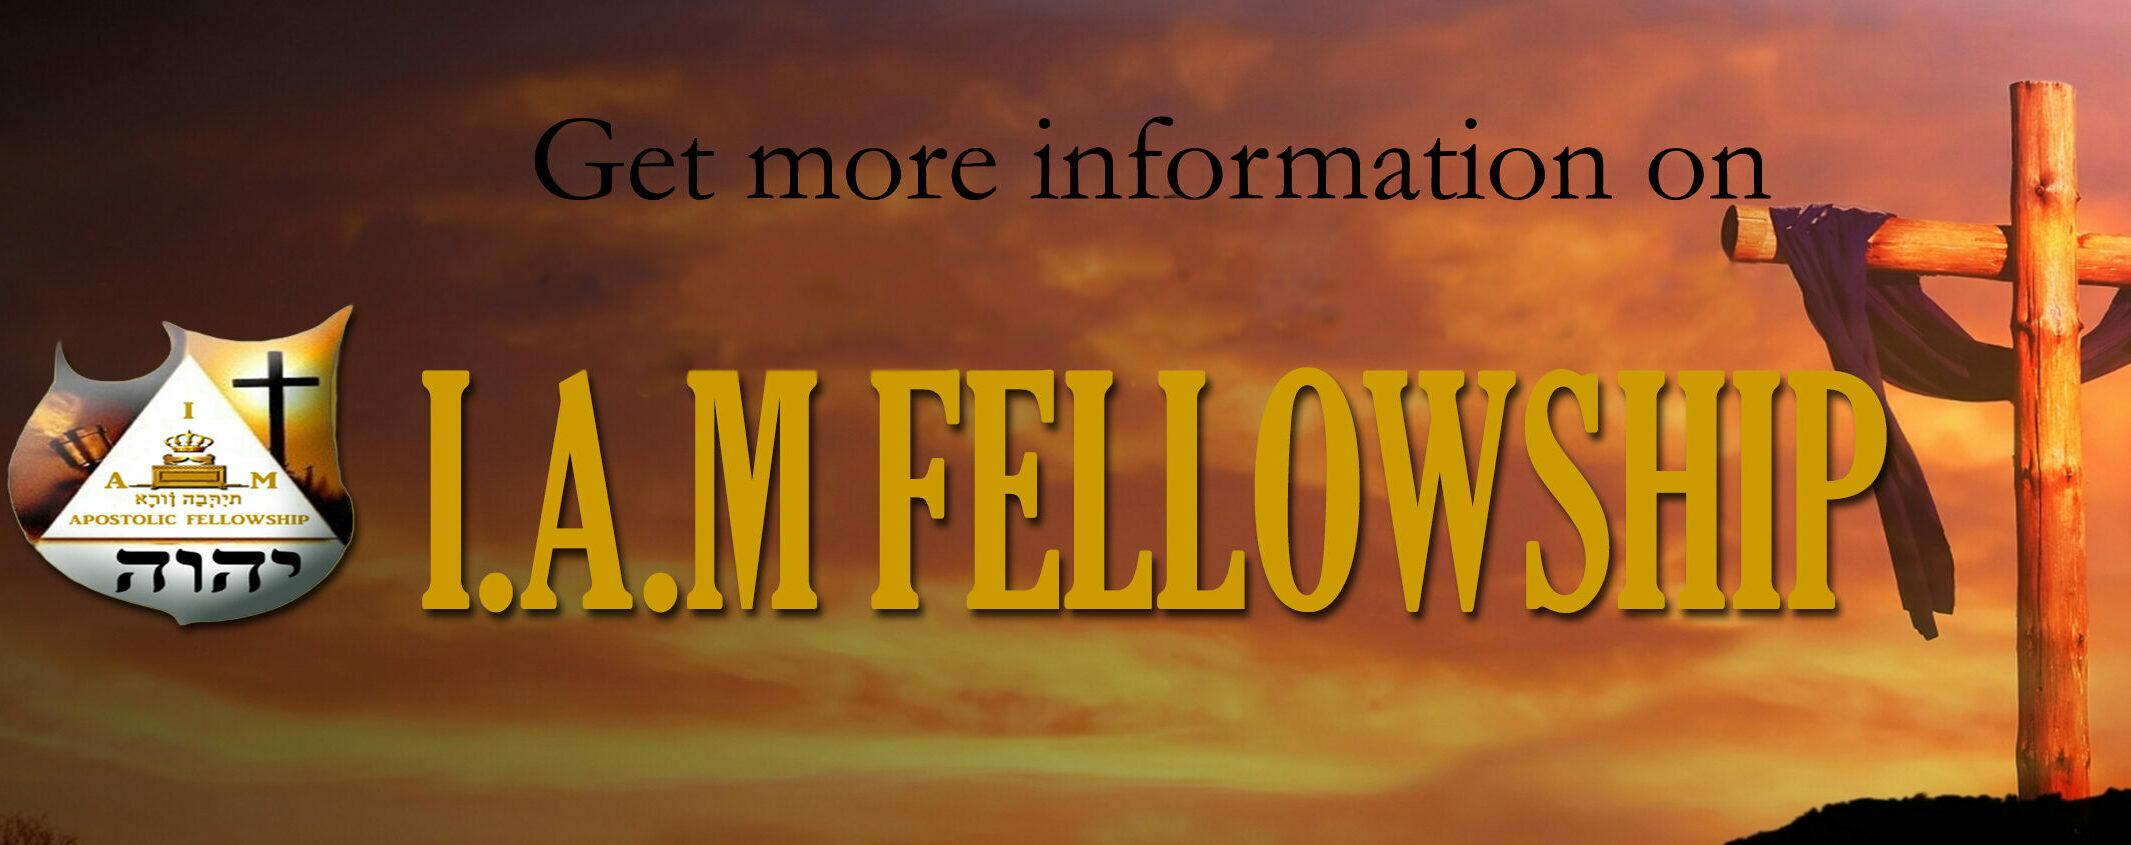 IAMFELLOWSHIP new